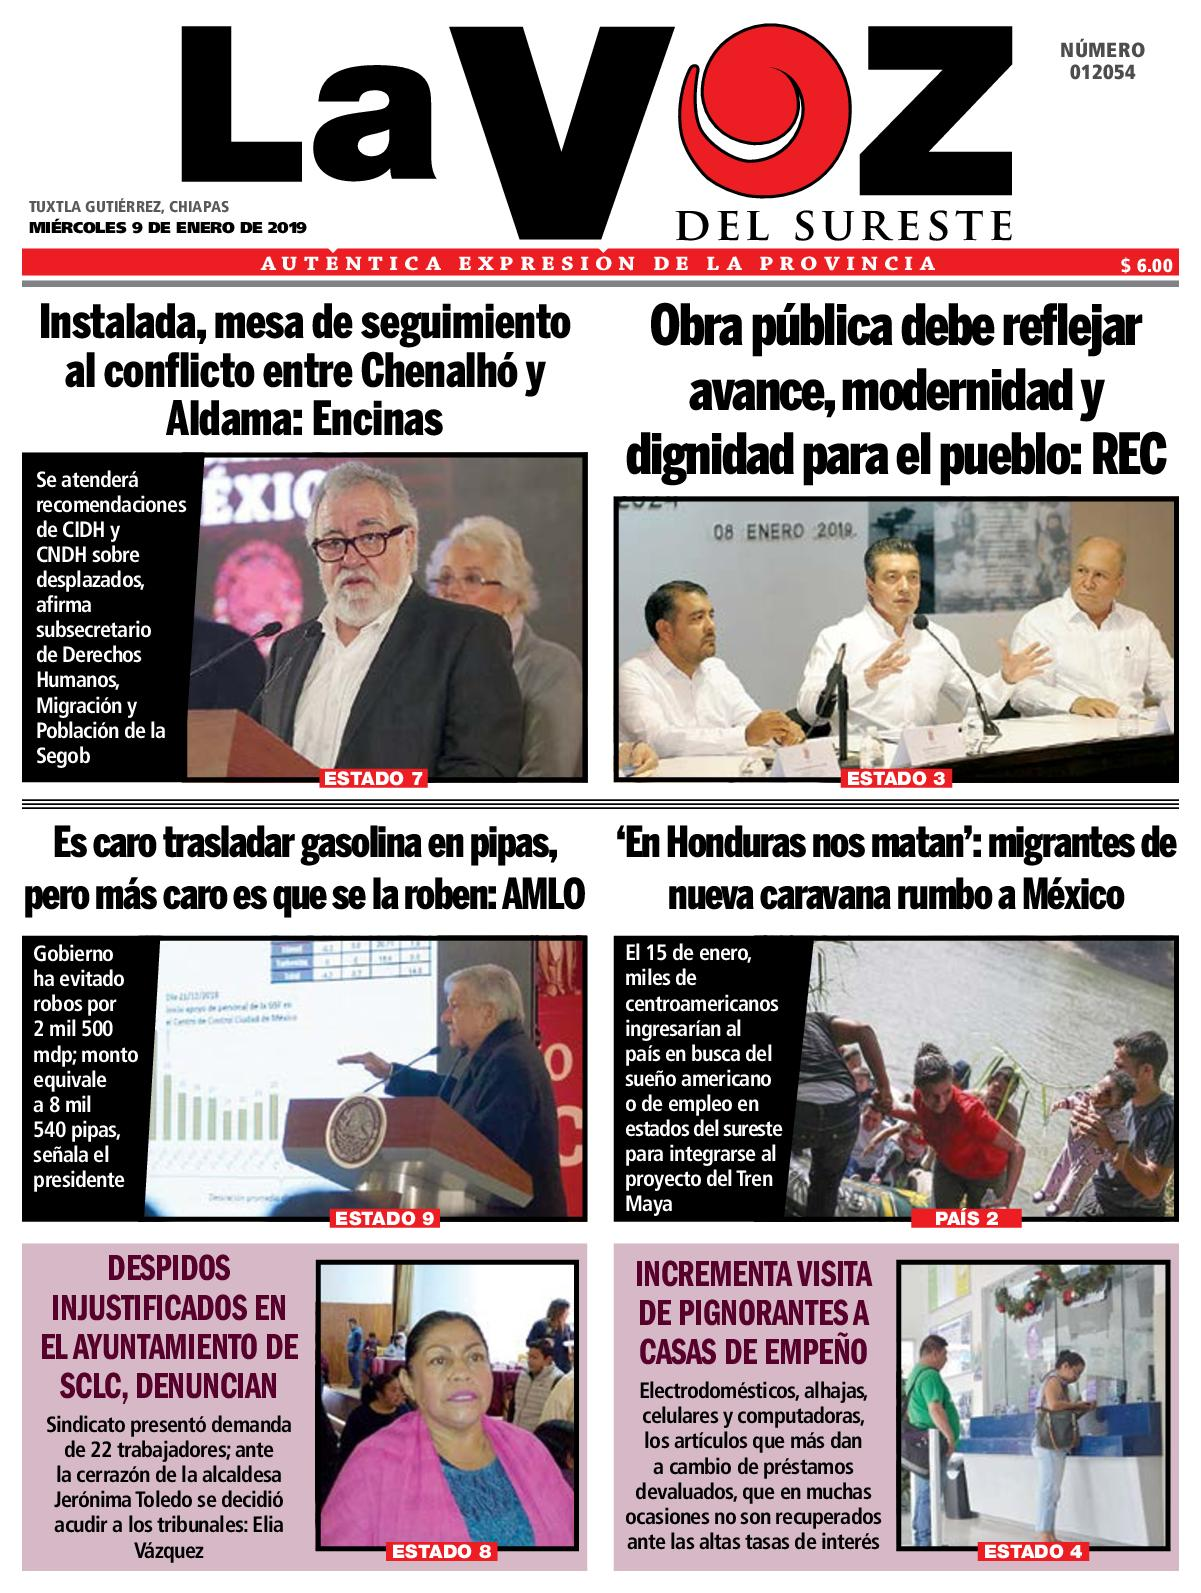 Caliente Sports mx comprar loteria euromillones en Guyana-215039